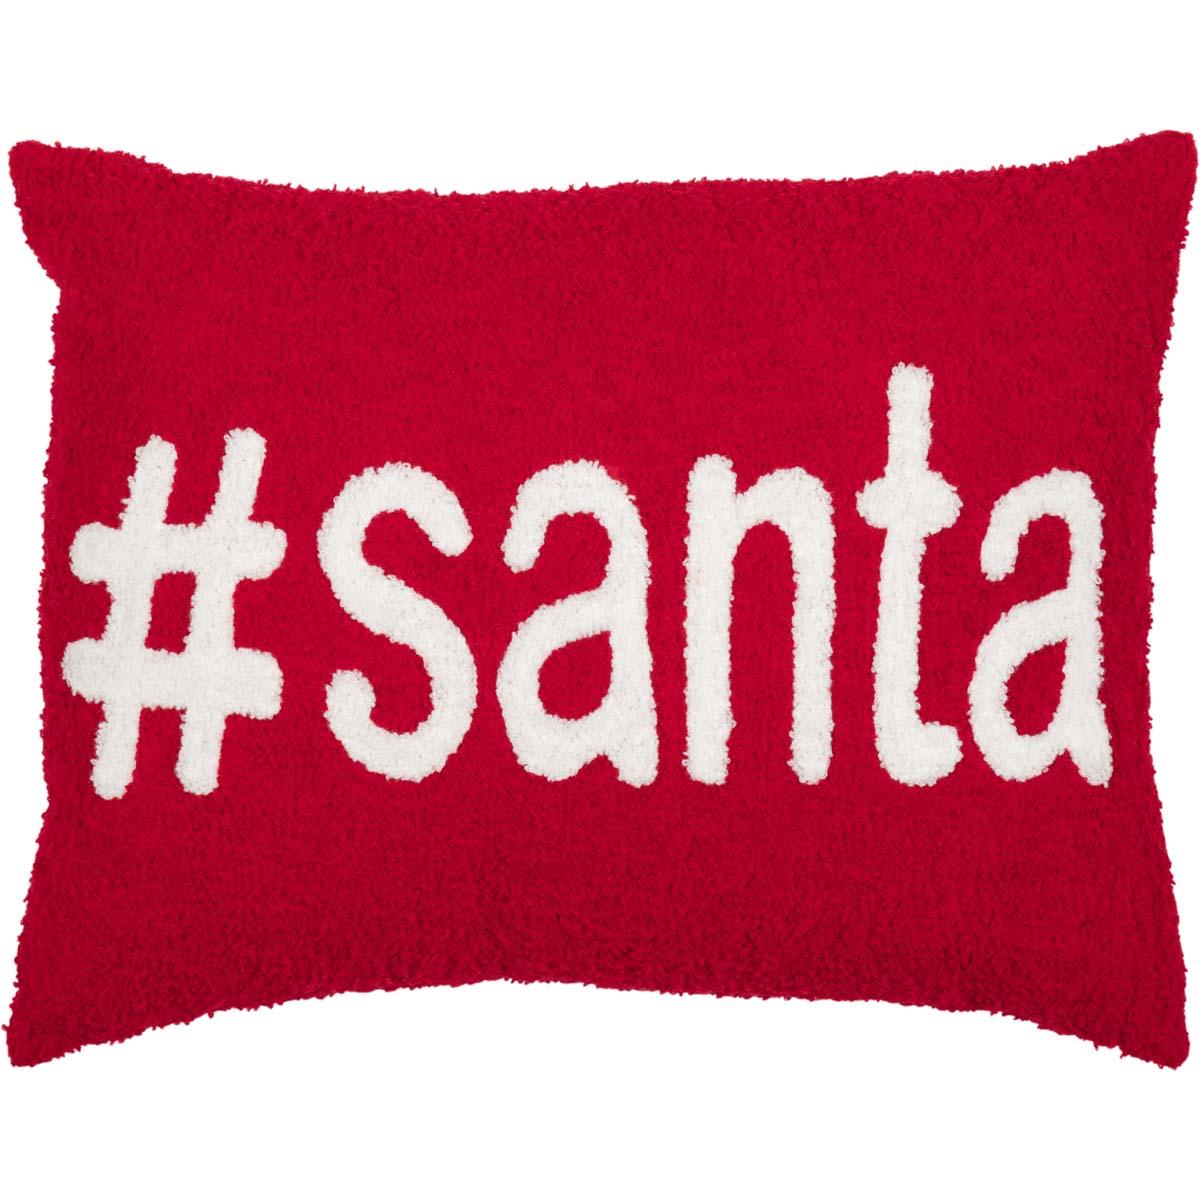 #Santa Pillow 14x18